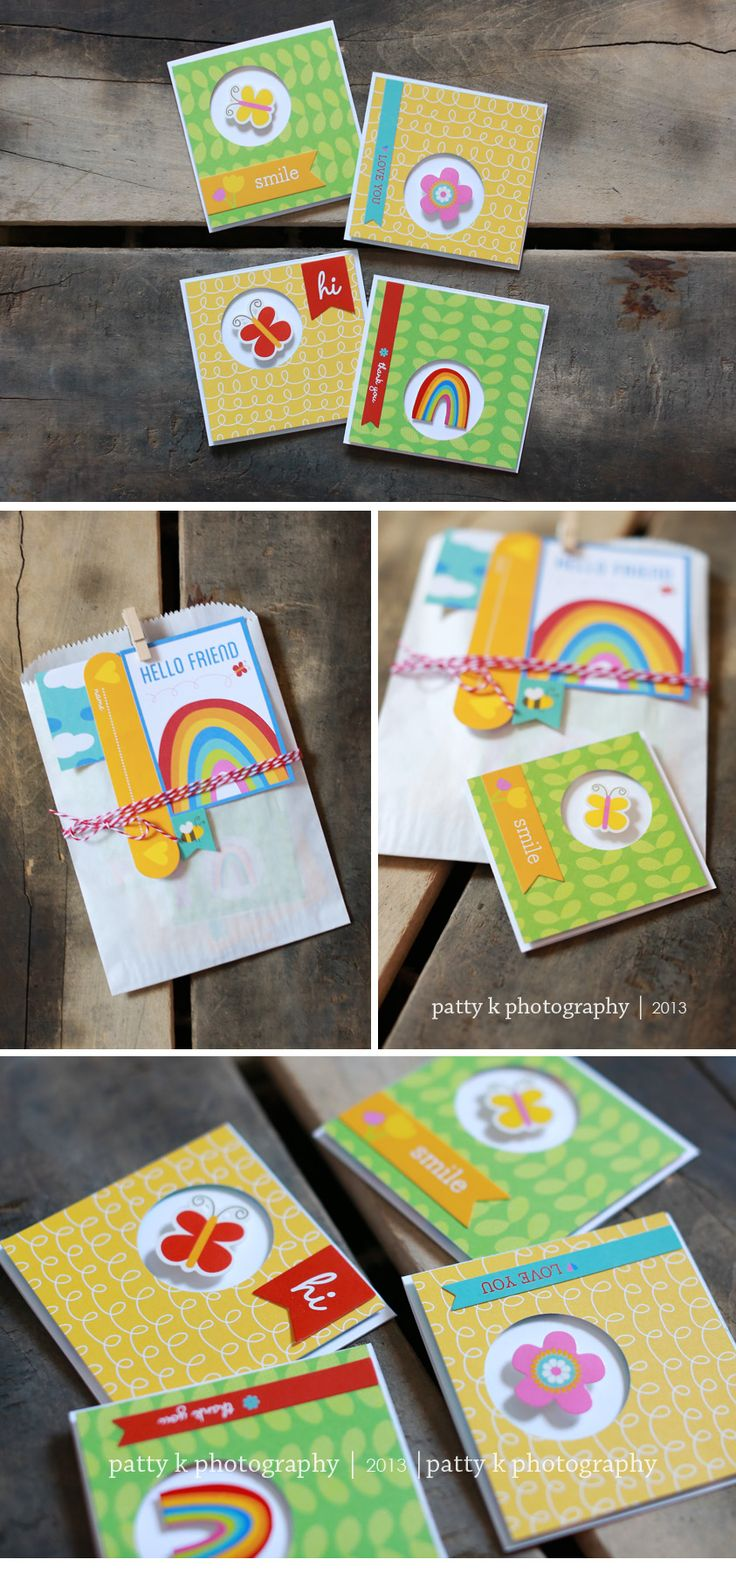 Mini Cards | Design | Pebbles Design Team | Patty K Photography & Design